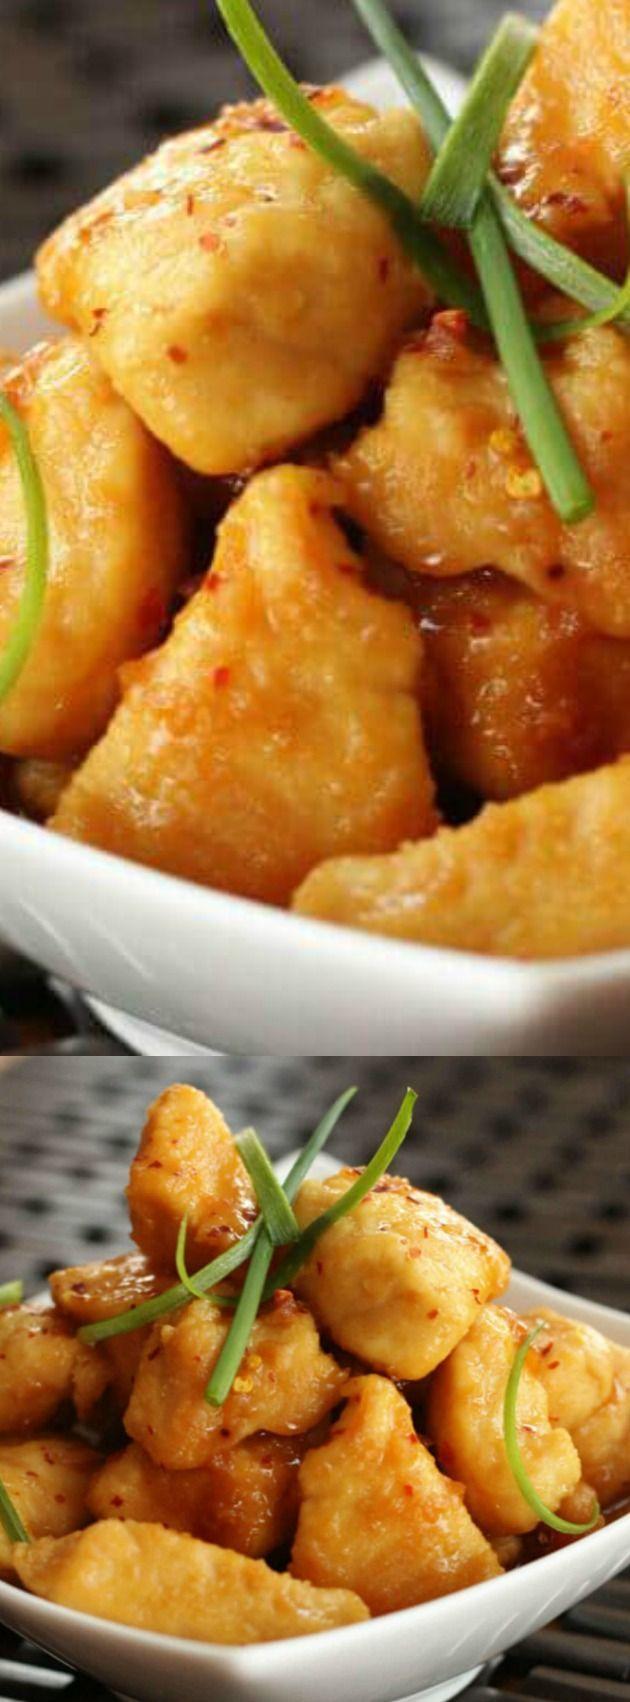 7 best Chinesisch und Wok images on Pinterest | Chinese, China and ...